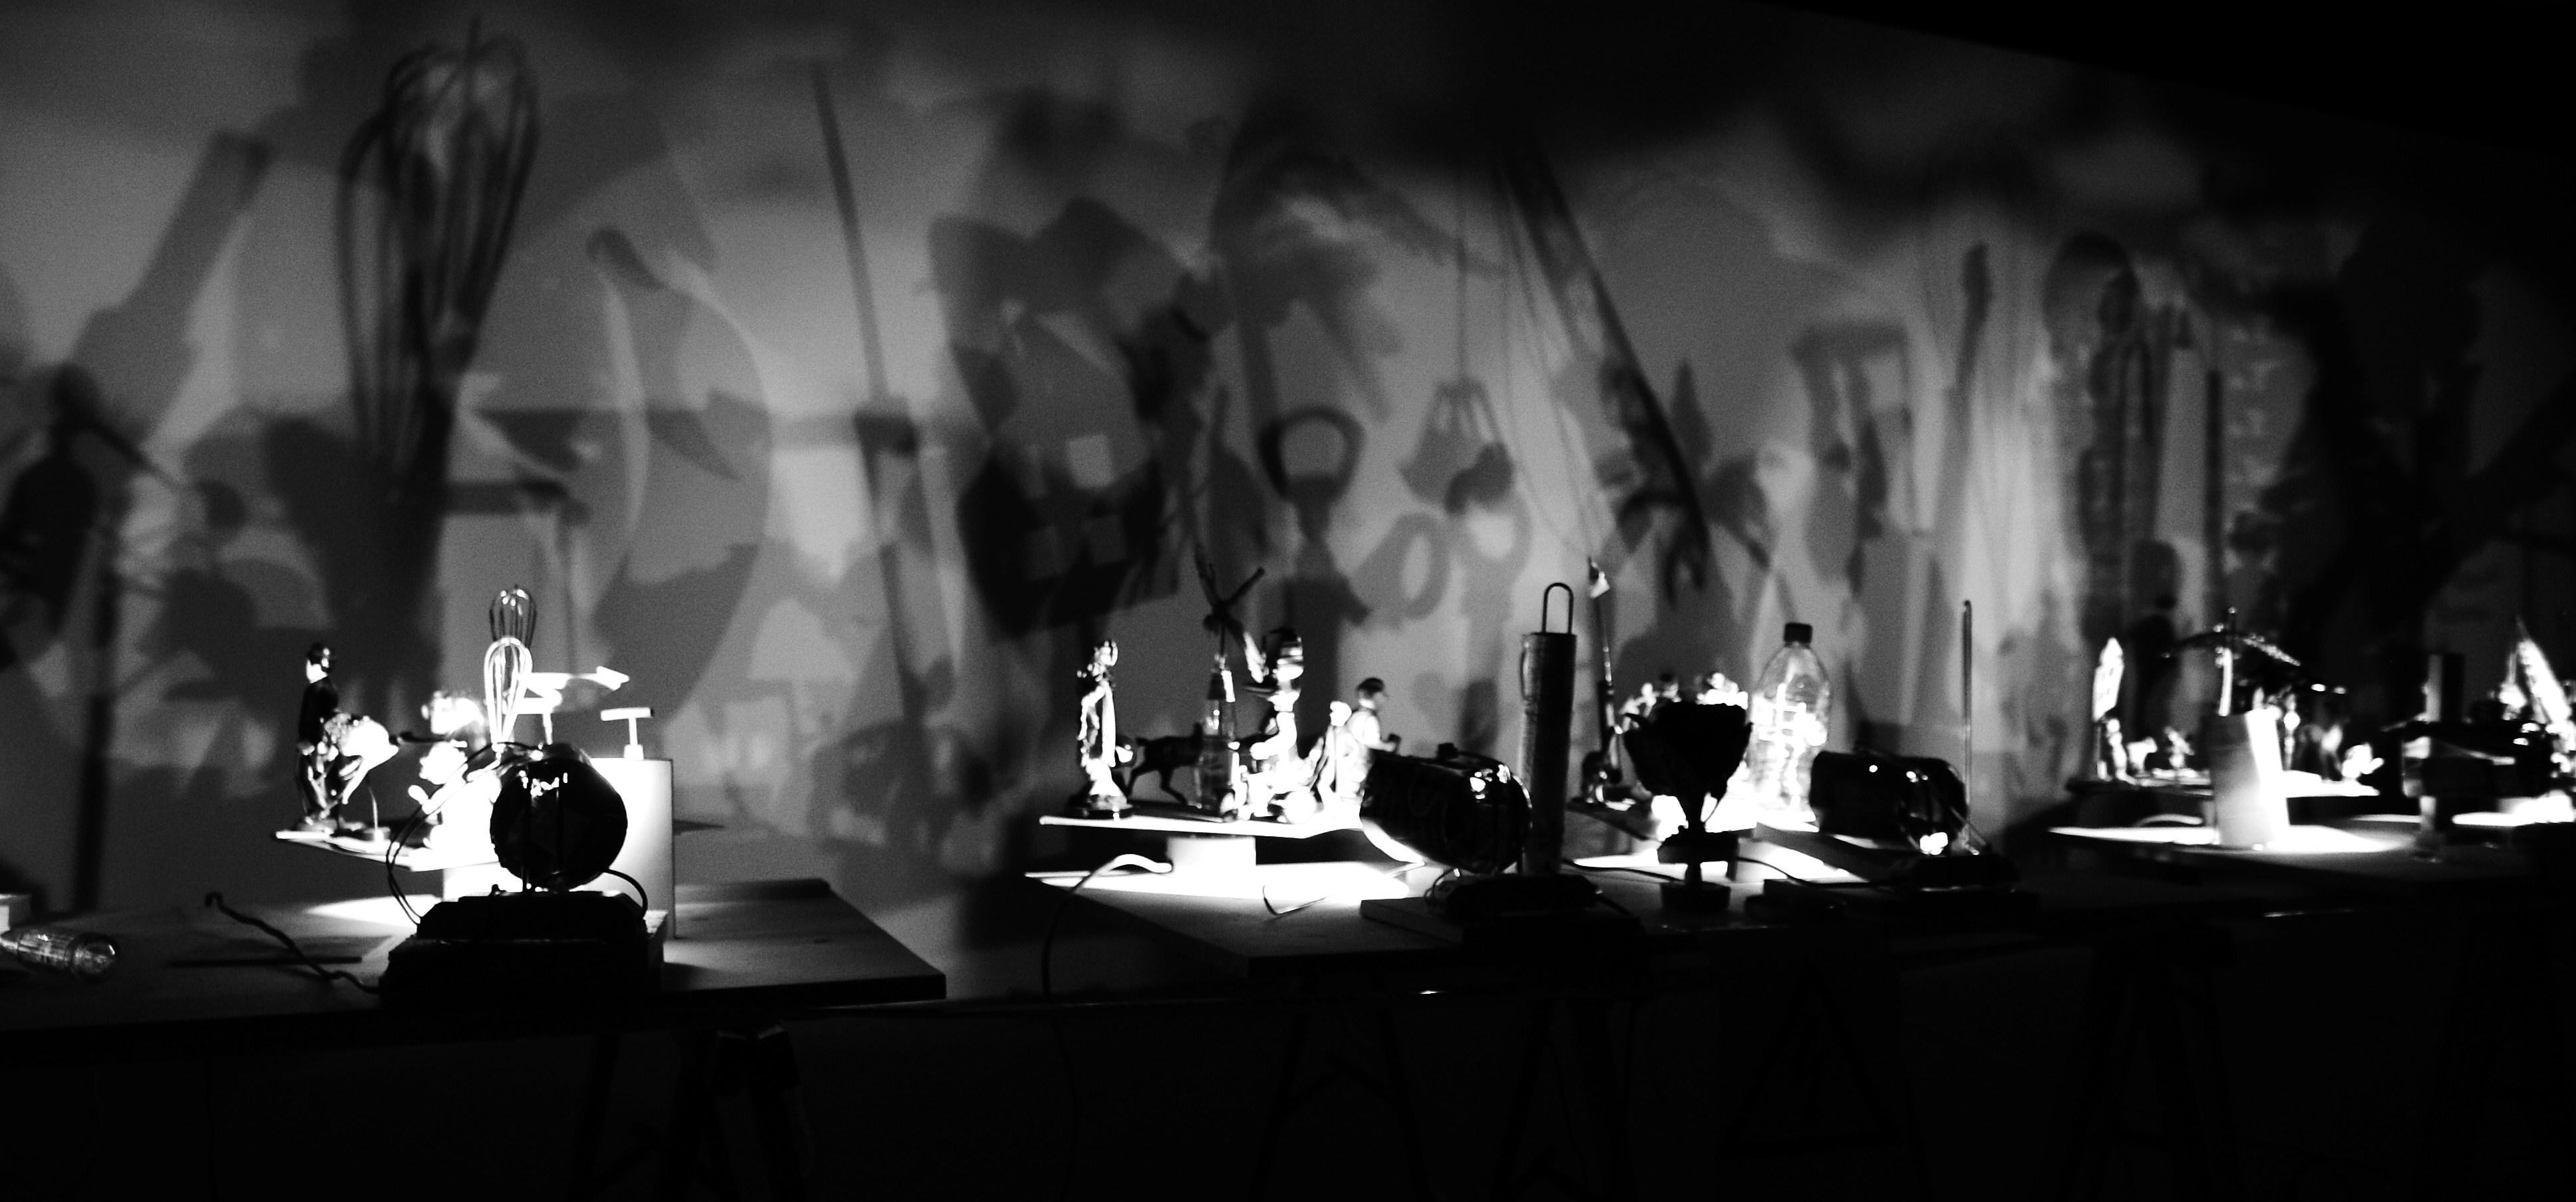 Hans Peter Feldman Shadow play 1941 ( my image)